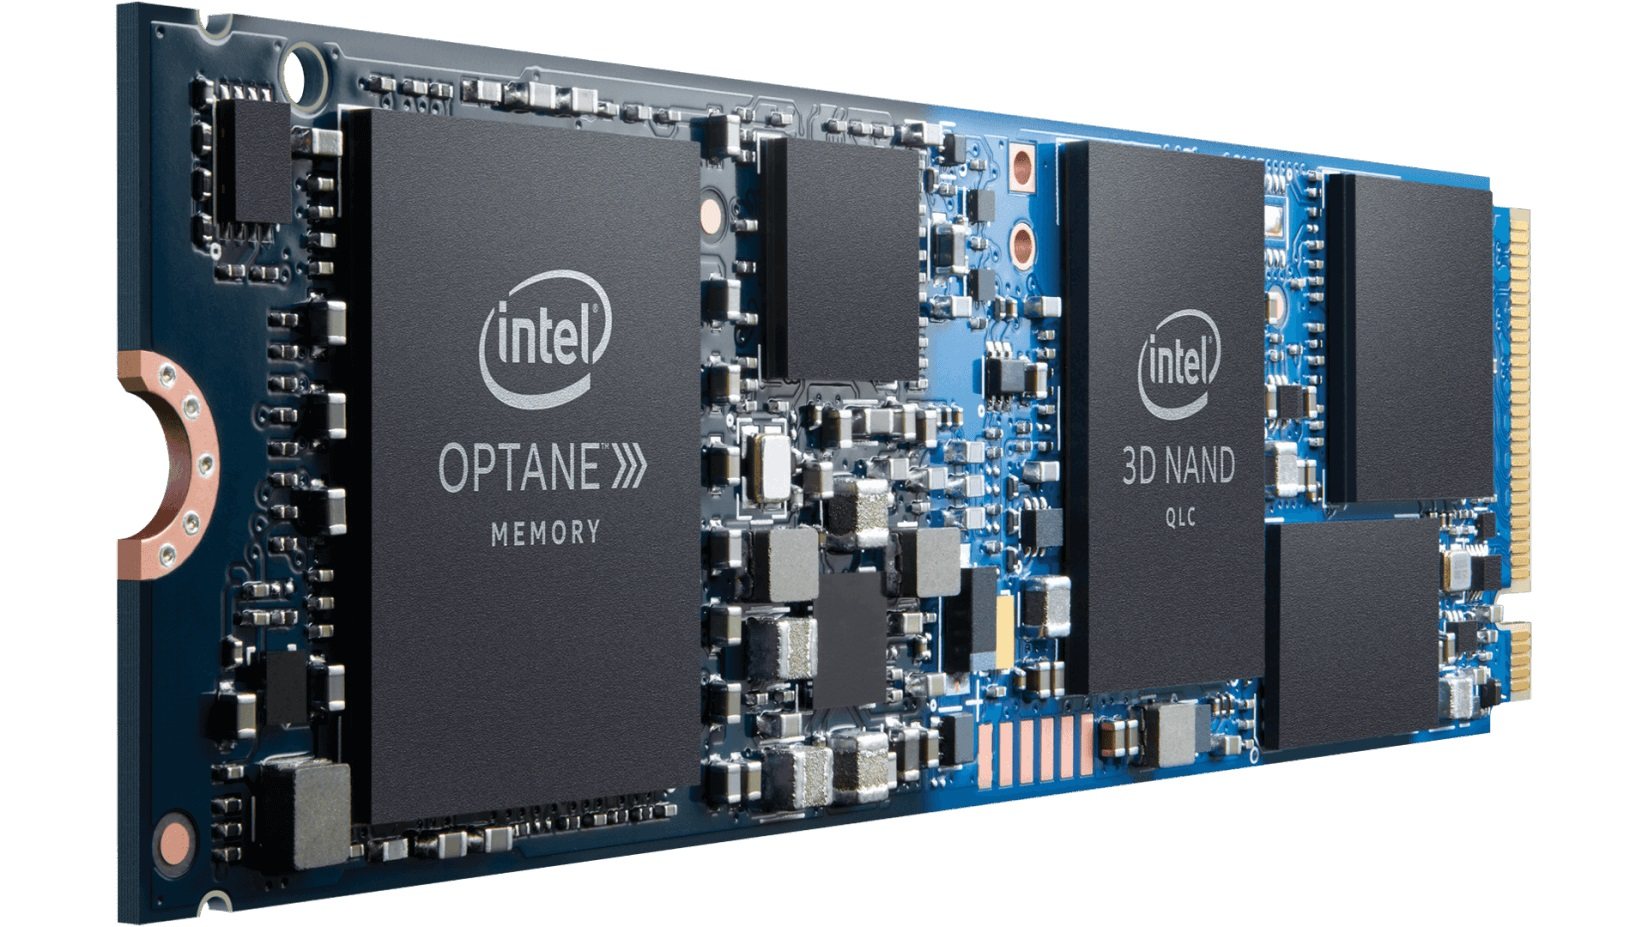 Intel Optane Memory H10 SSD